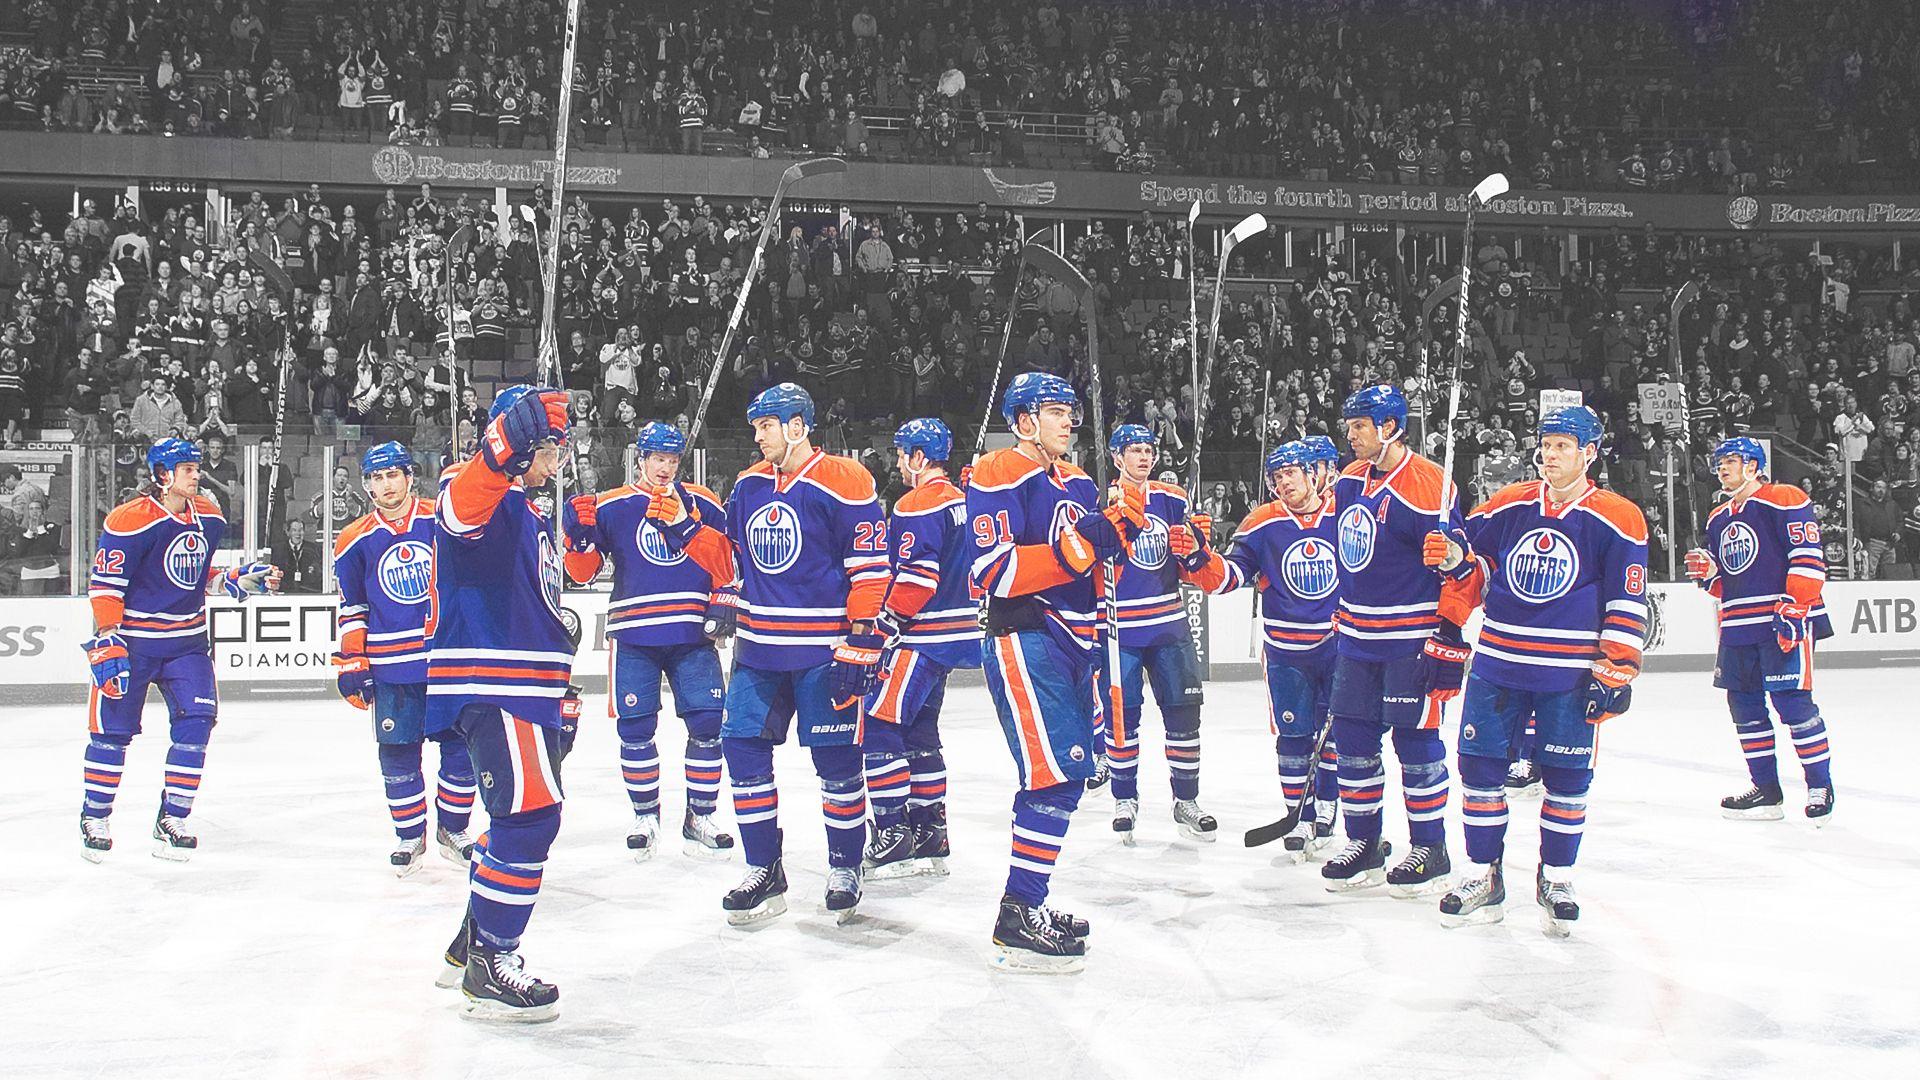 Top Wallpaper Logo Edmonton Oilers - f1339273fe5d28afb287cf48fc8893f8  Picture_244862.jpg